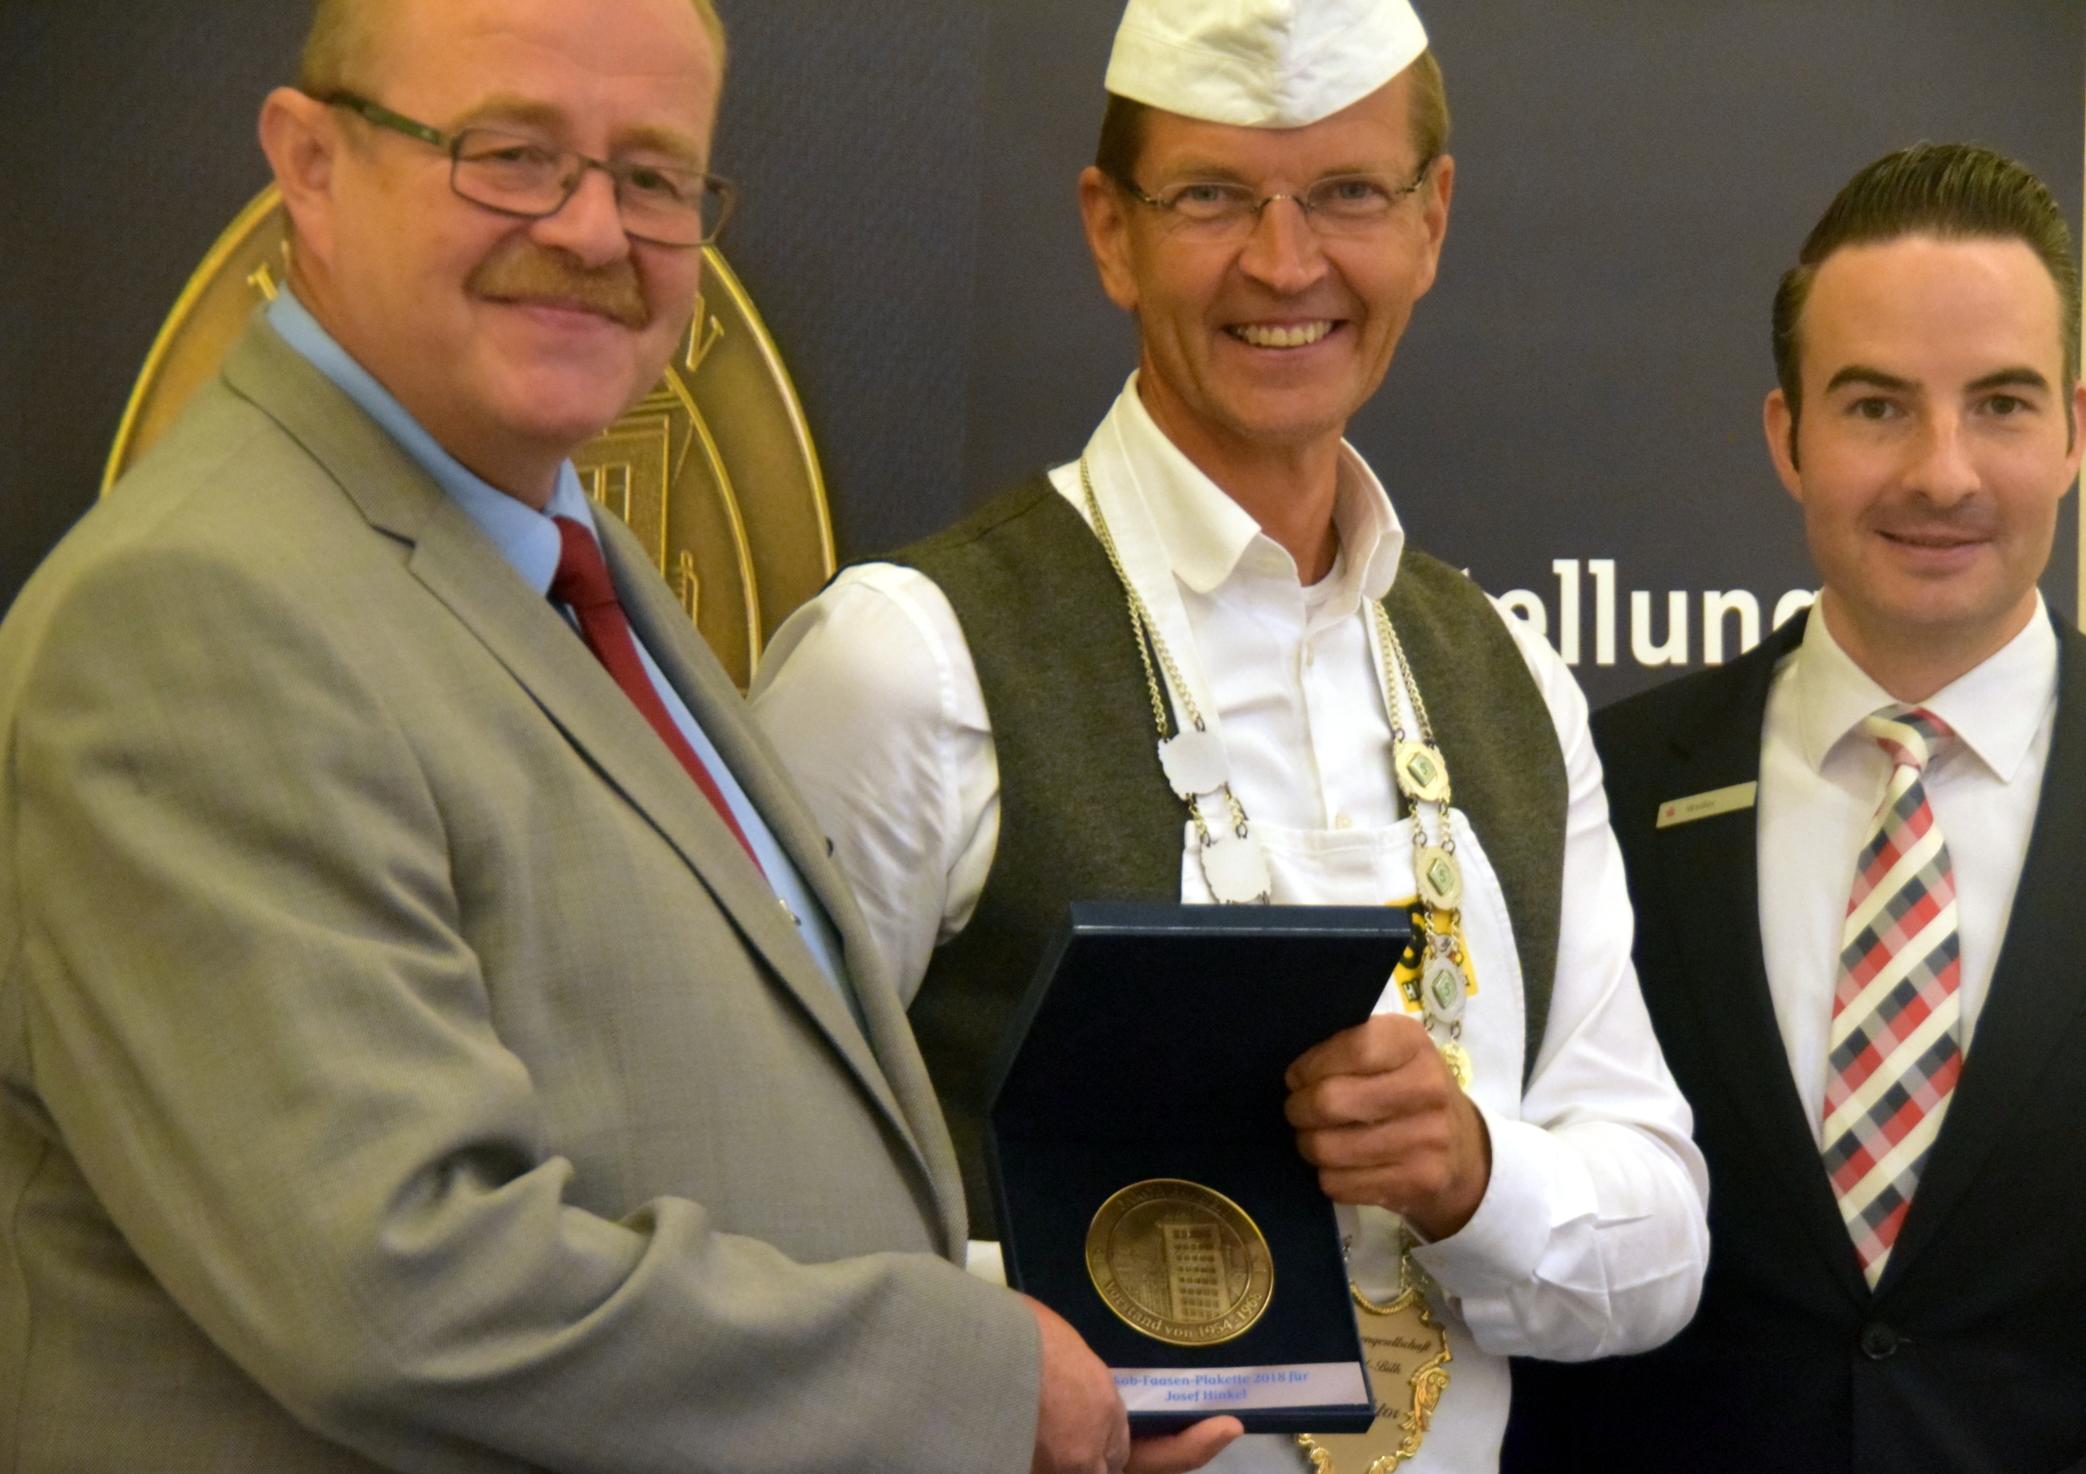 Josef Hinkel ist diesjähriger Preisträger der Jakob-Faasen-Plakette…